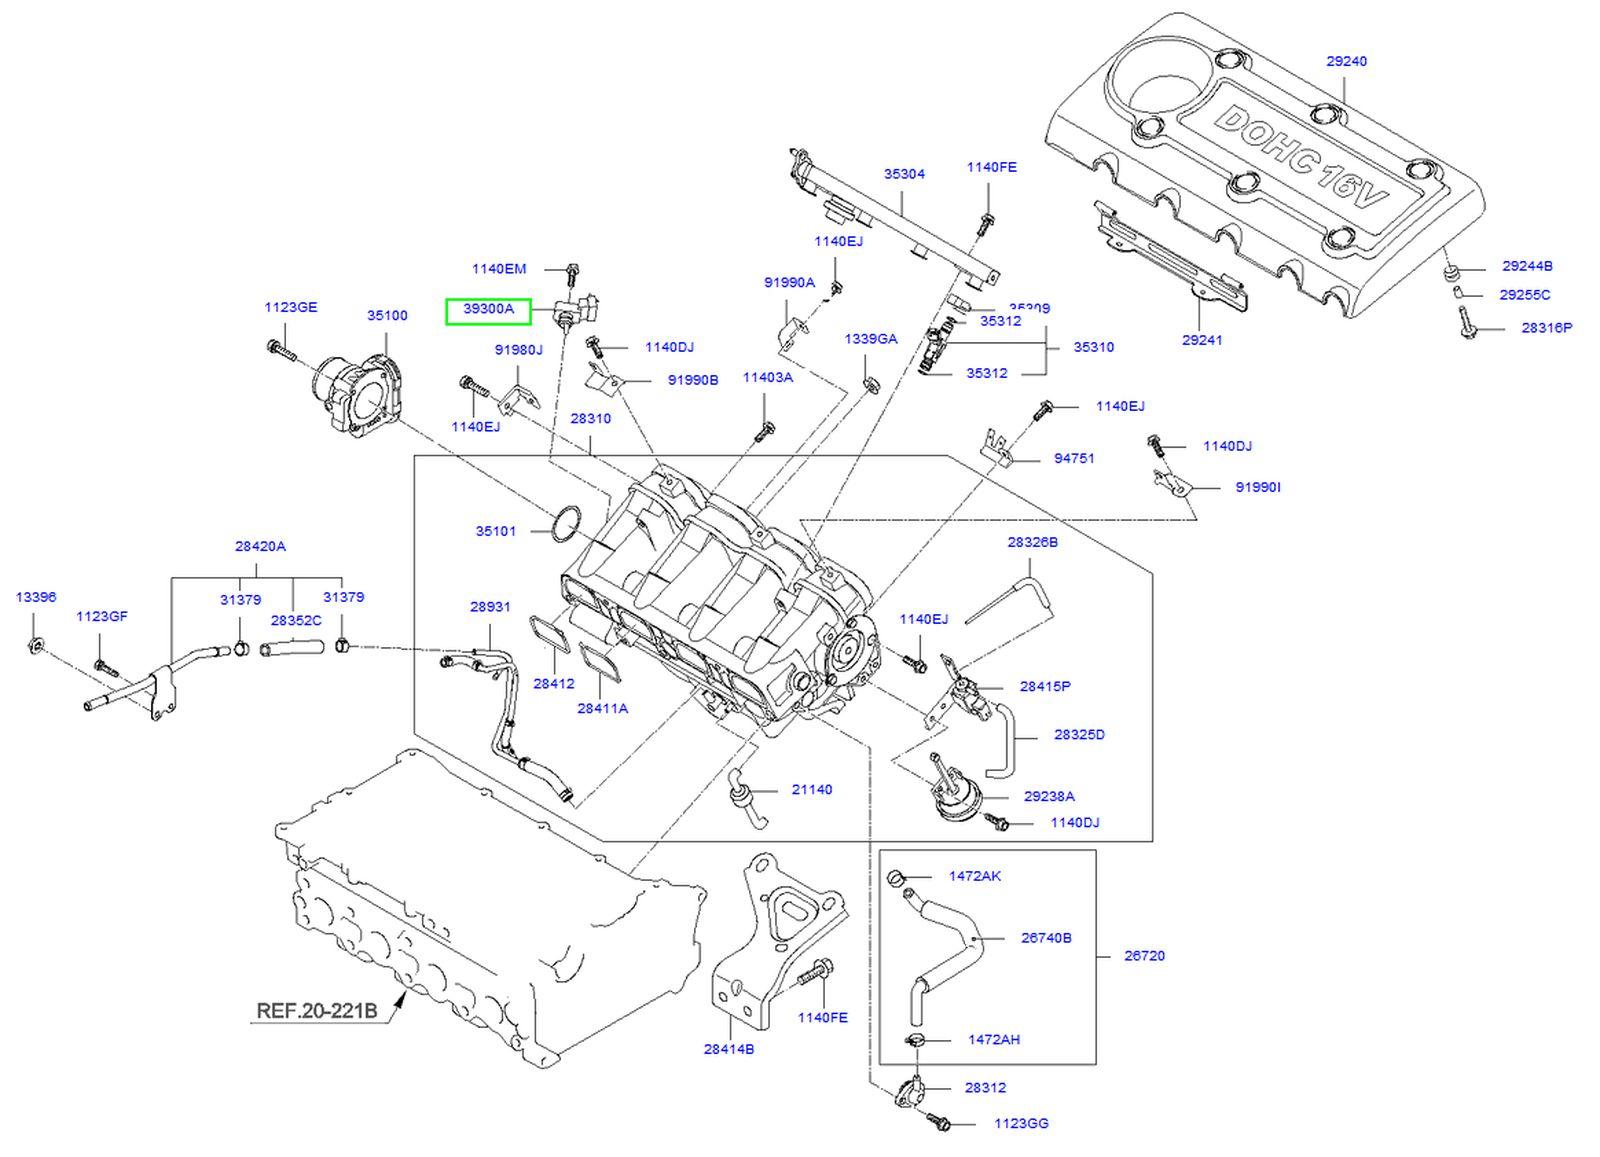 2003 Kium Sorento Lx Engine Diagram